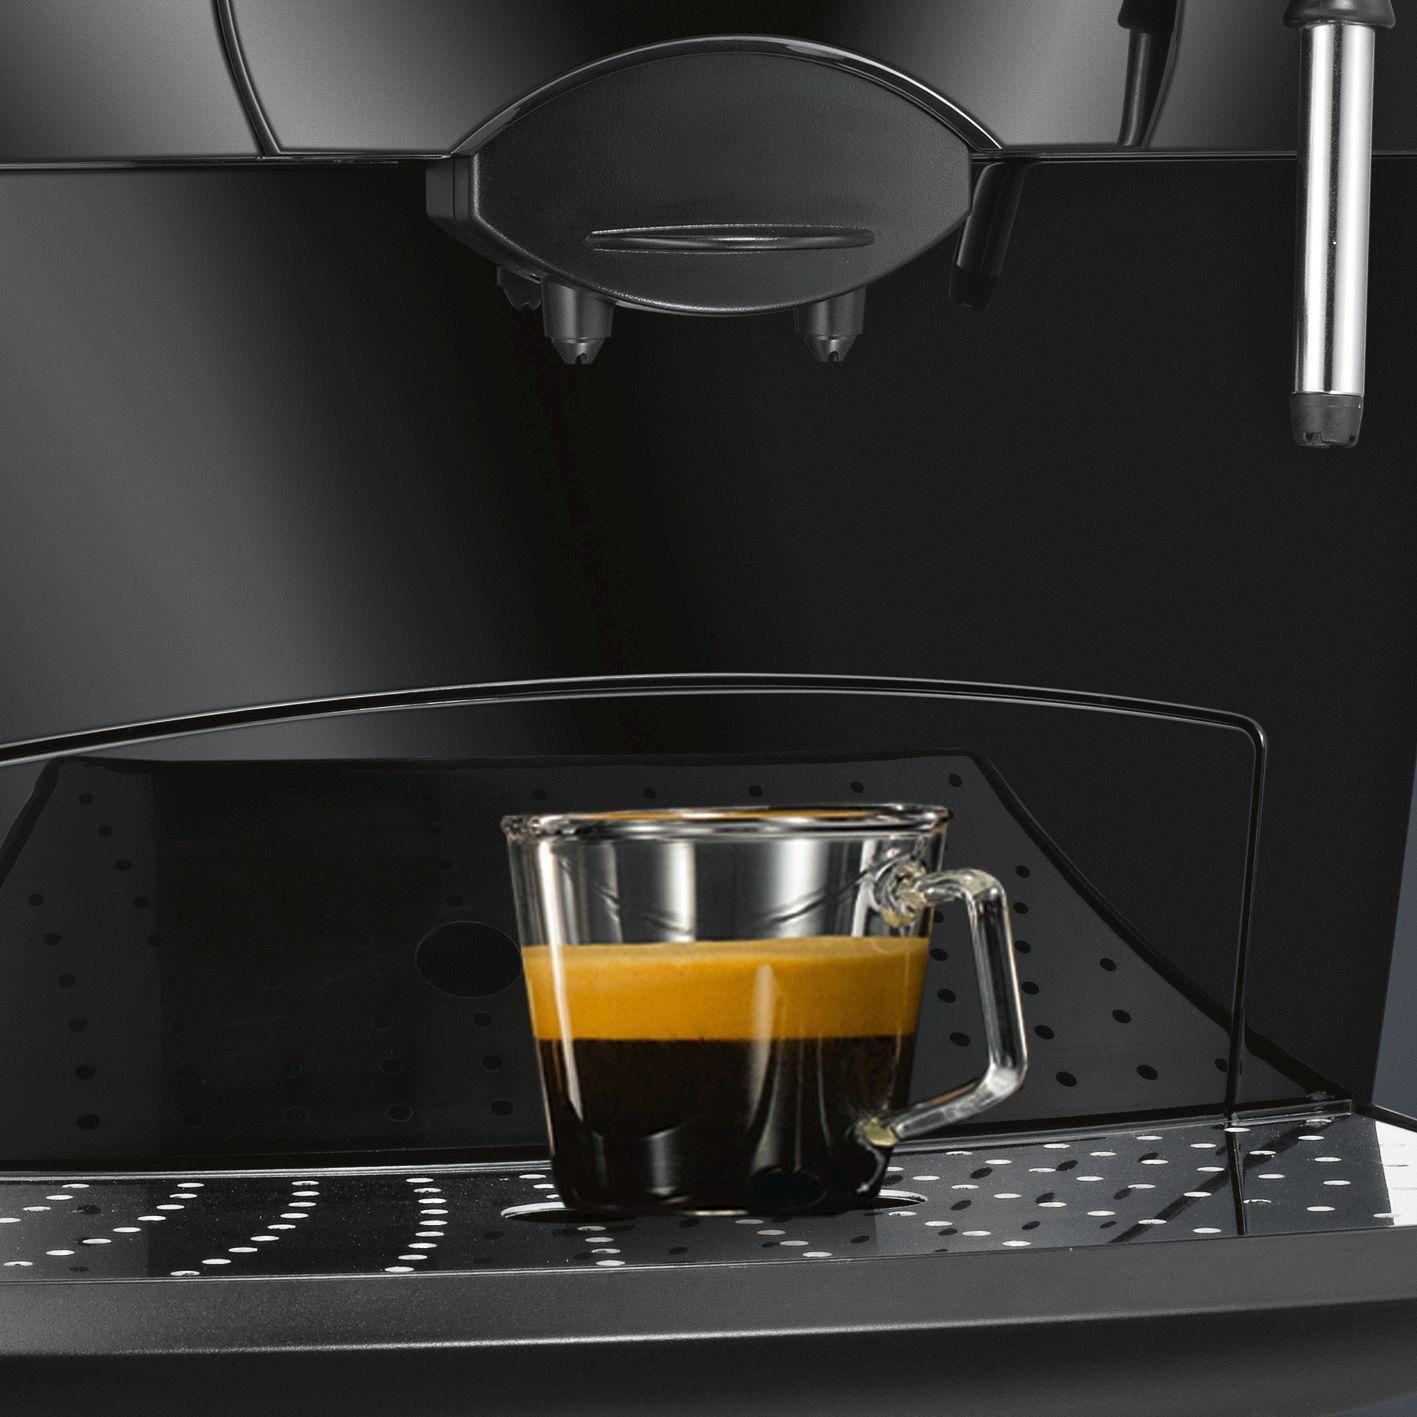 Kavos aparatas Siemens surpresso compact TK53009 juodas | Varle.lt